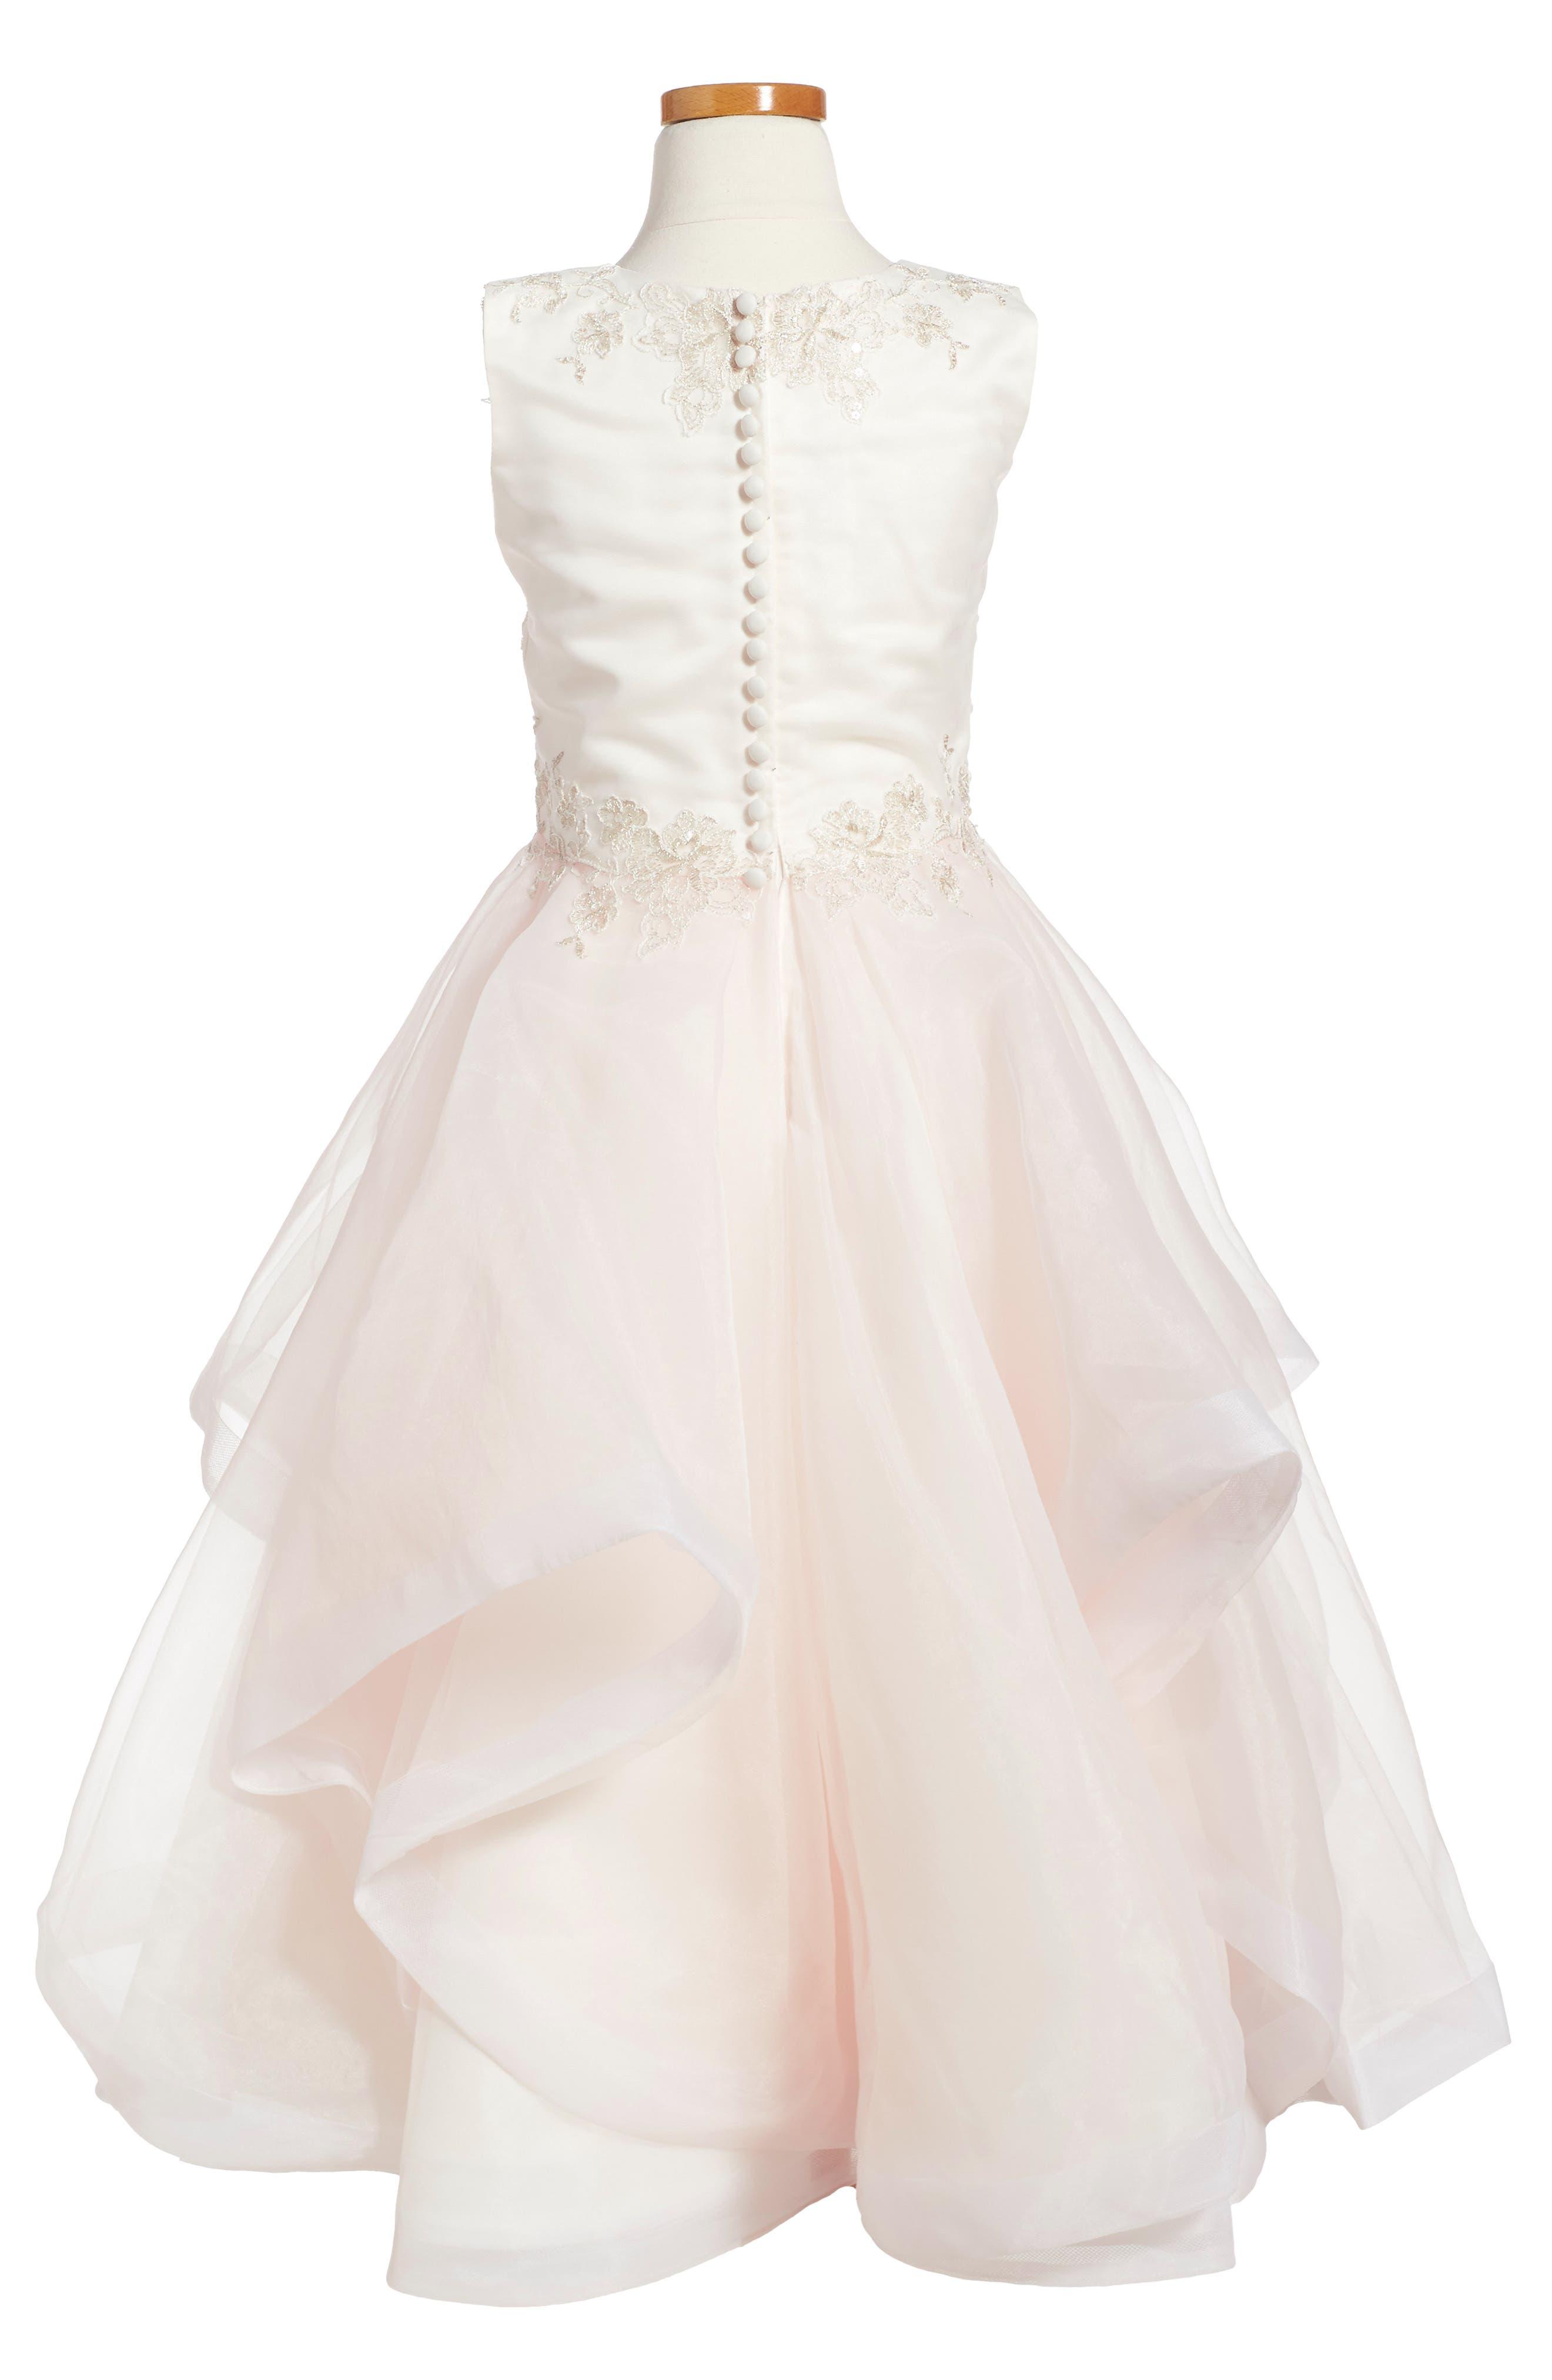 Tulle & Organza Dress,                             Alternate thumbnail 2, color,                             900